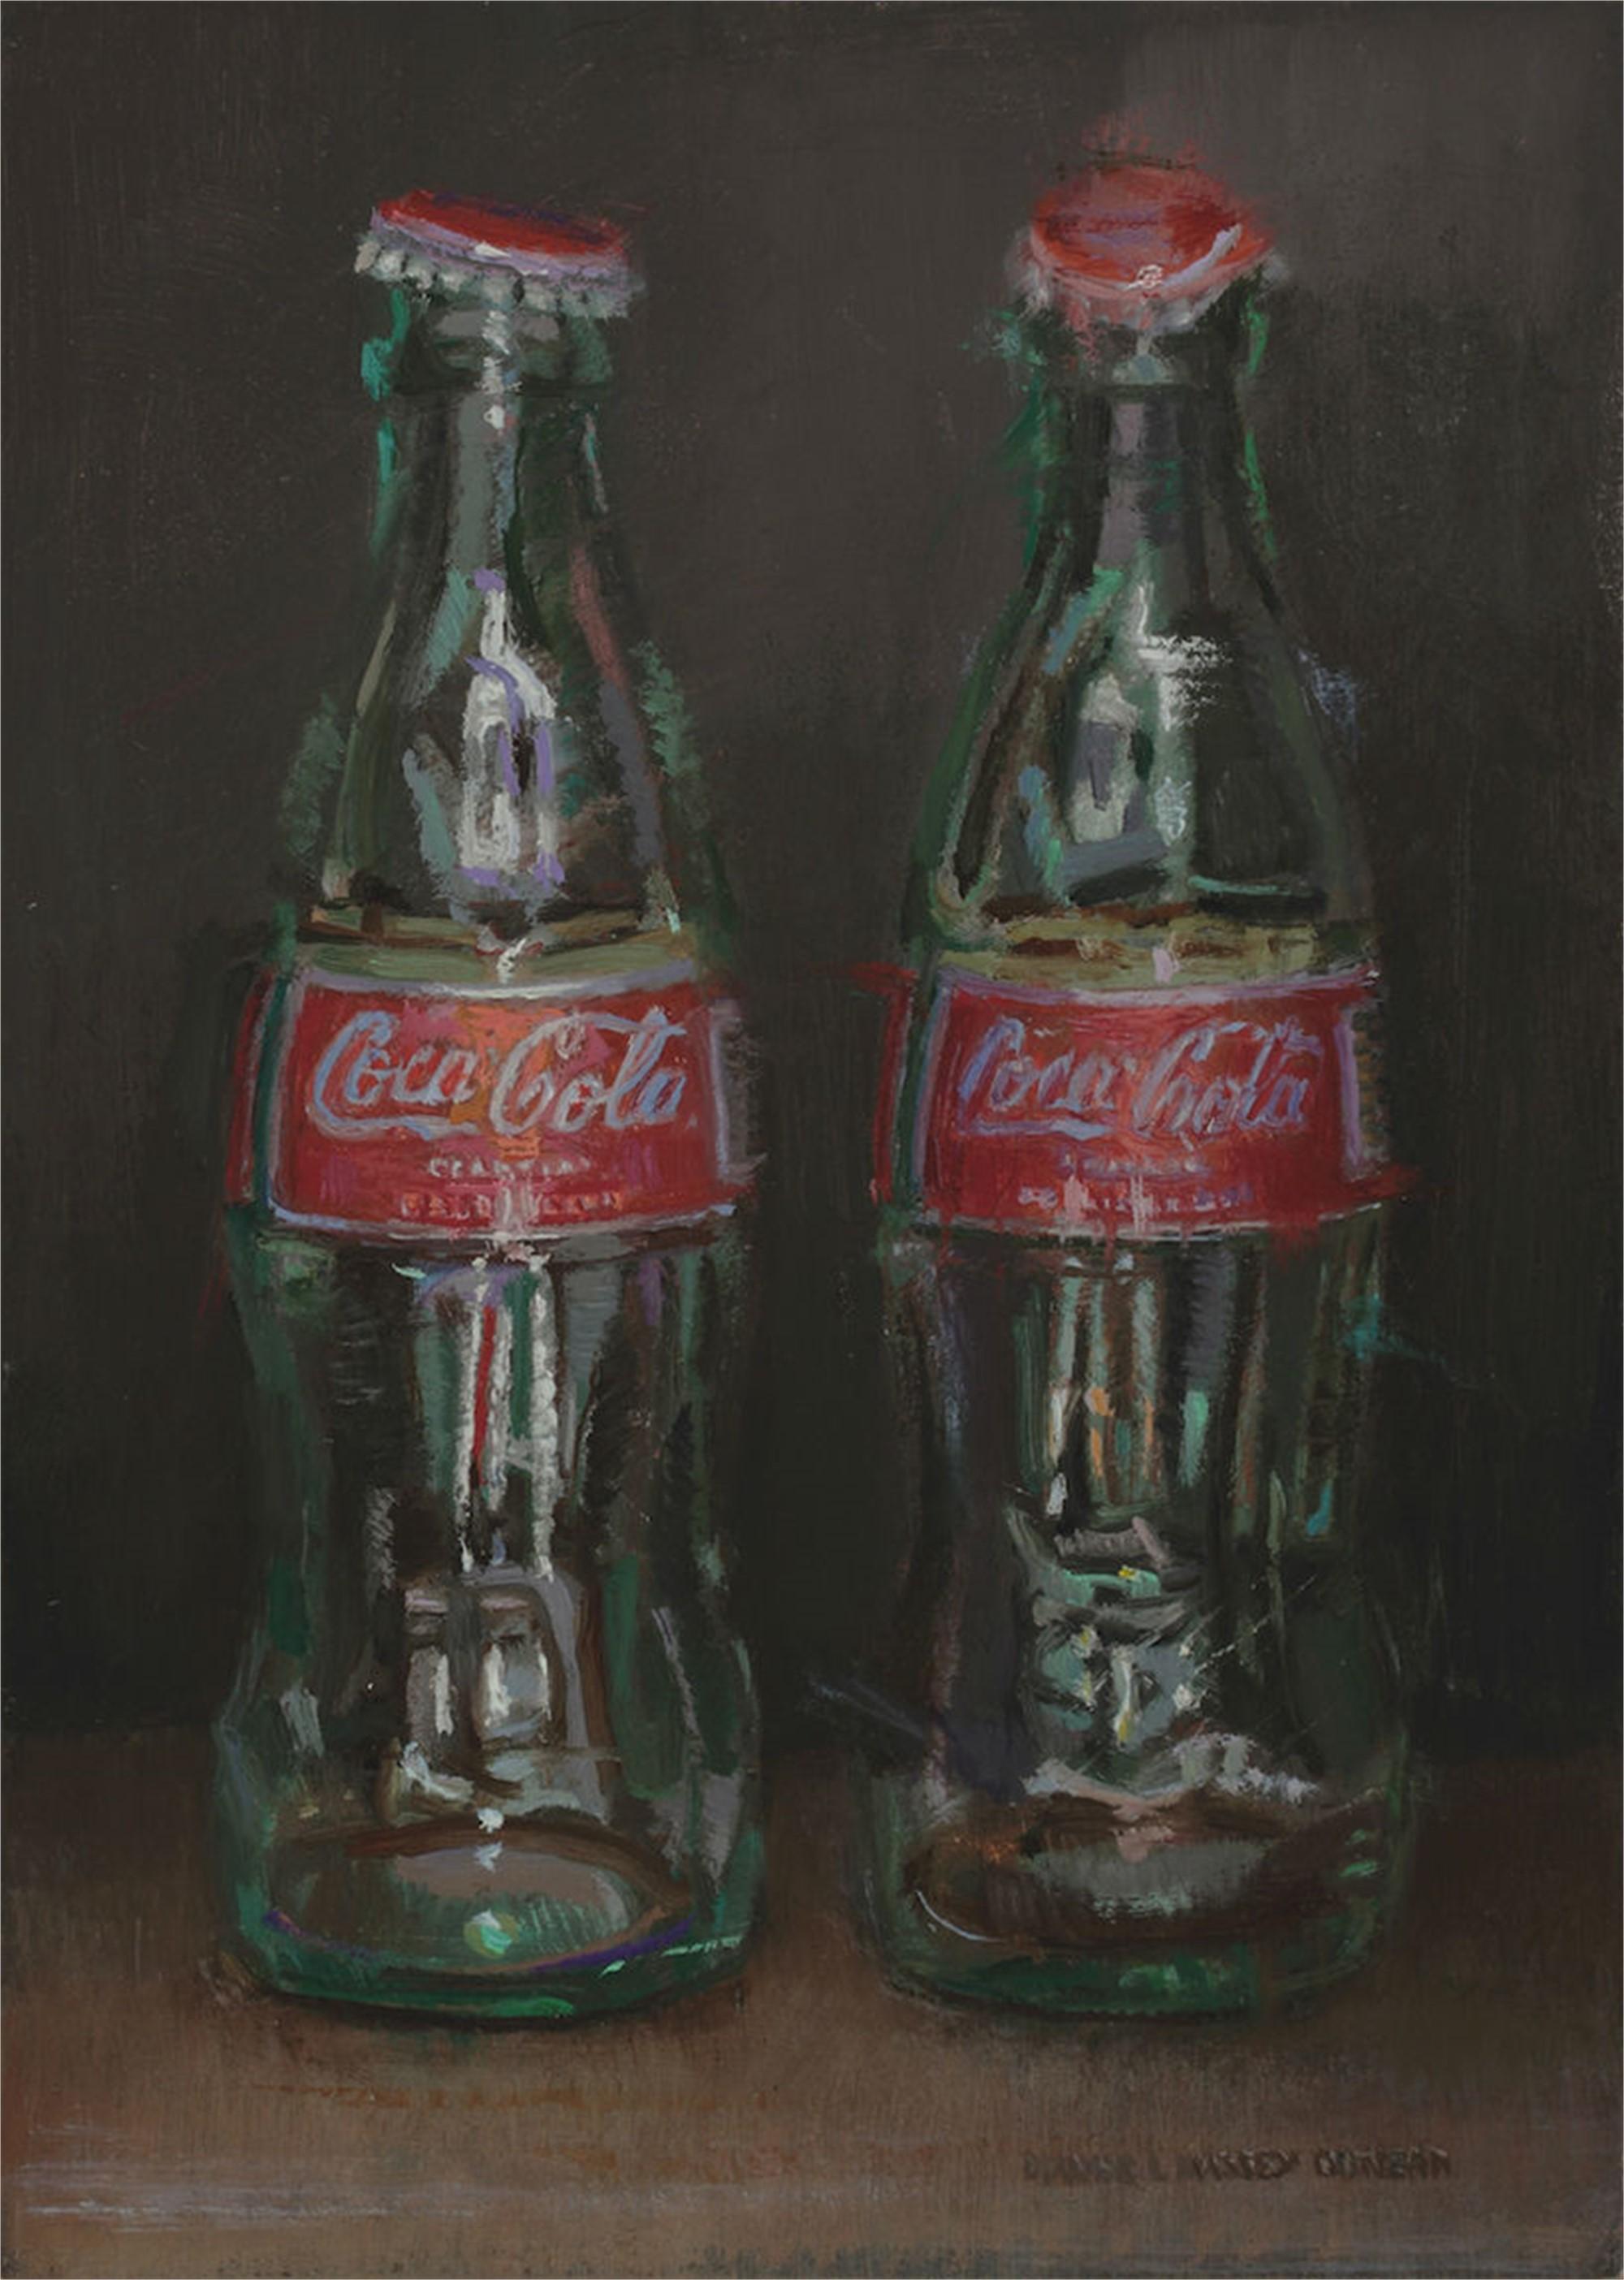 Two Bottles by Dianne L Massey Dunbar